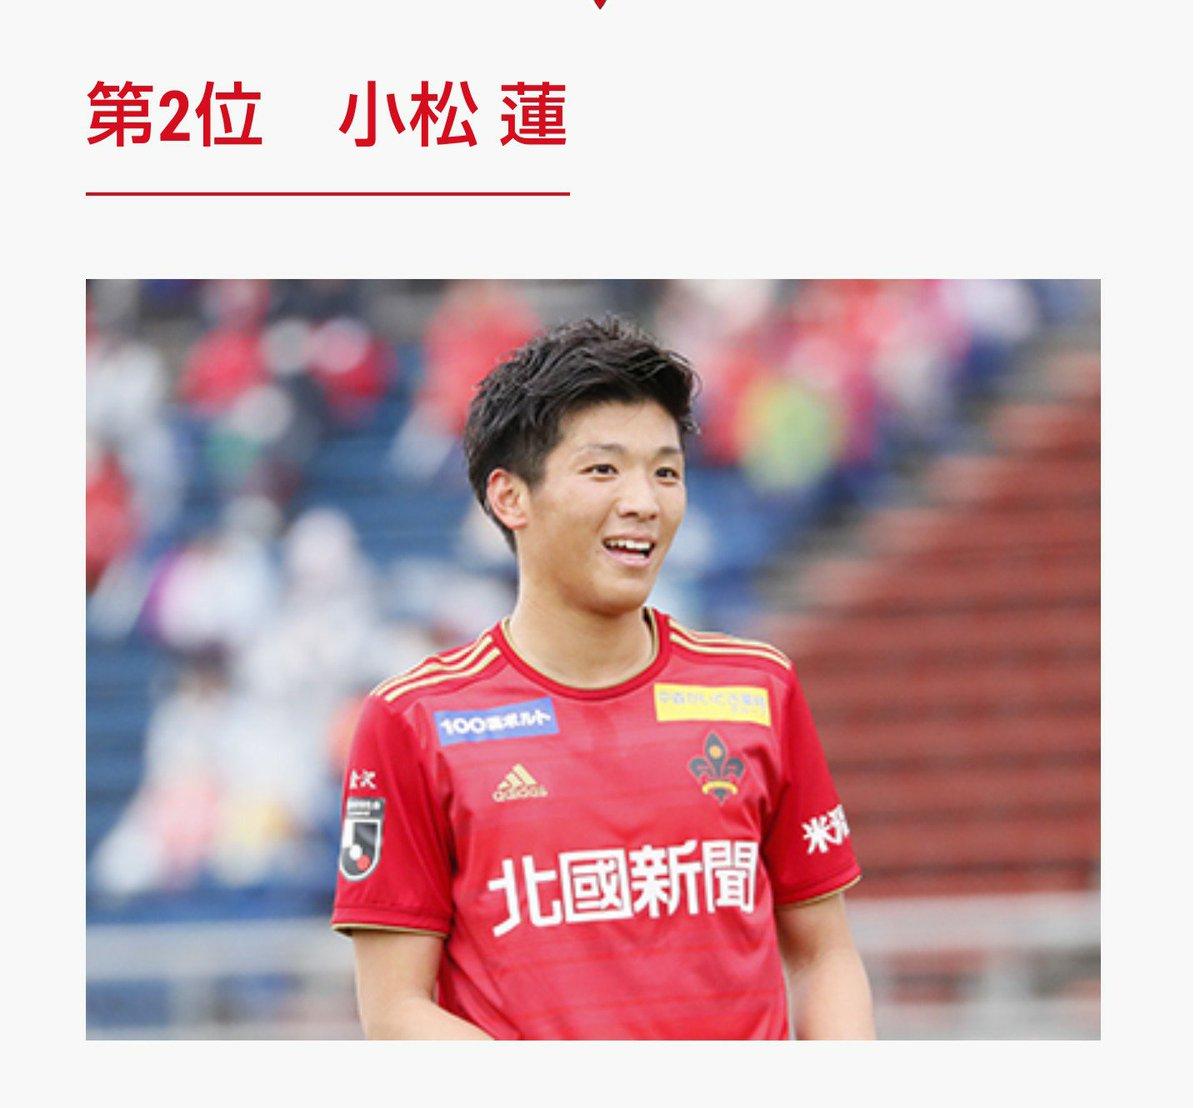 RT @hossy_0520: 【2019ツエーゲン金沢総選挙】 松本山雅FCより期限付移籍で今季加入した「小松...